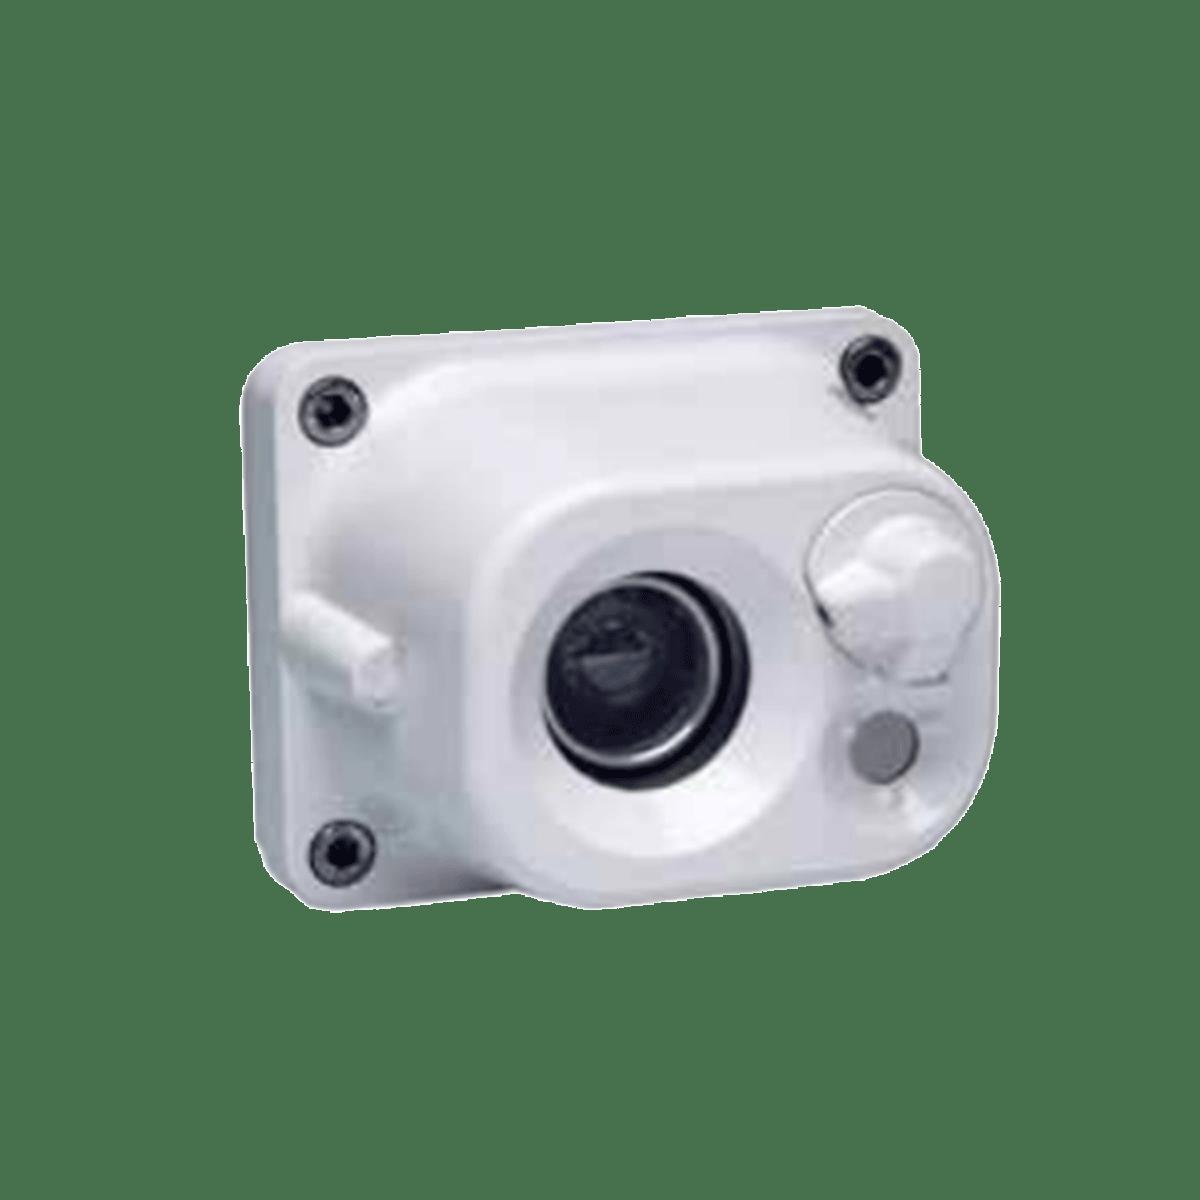 Omniguard-660-Ultraviolet-Flame-Dectector